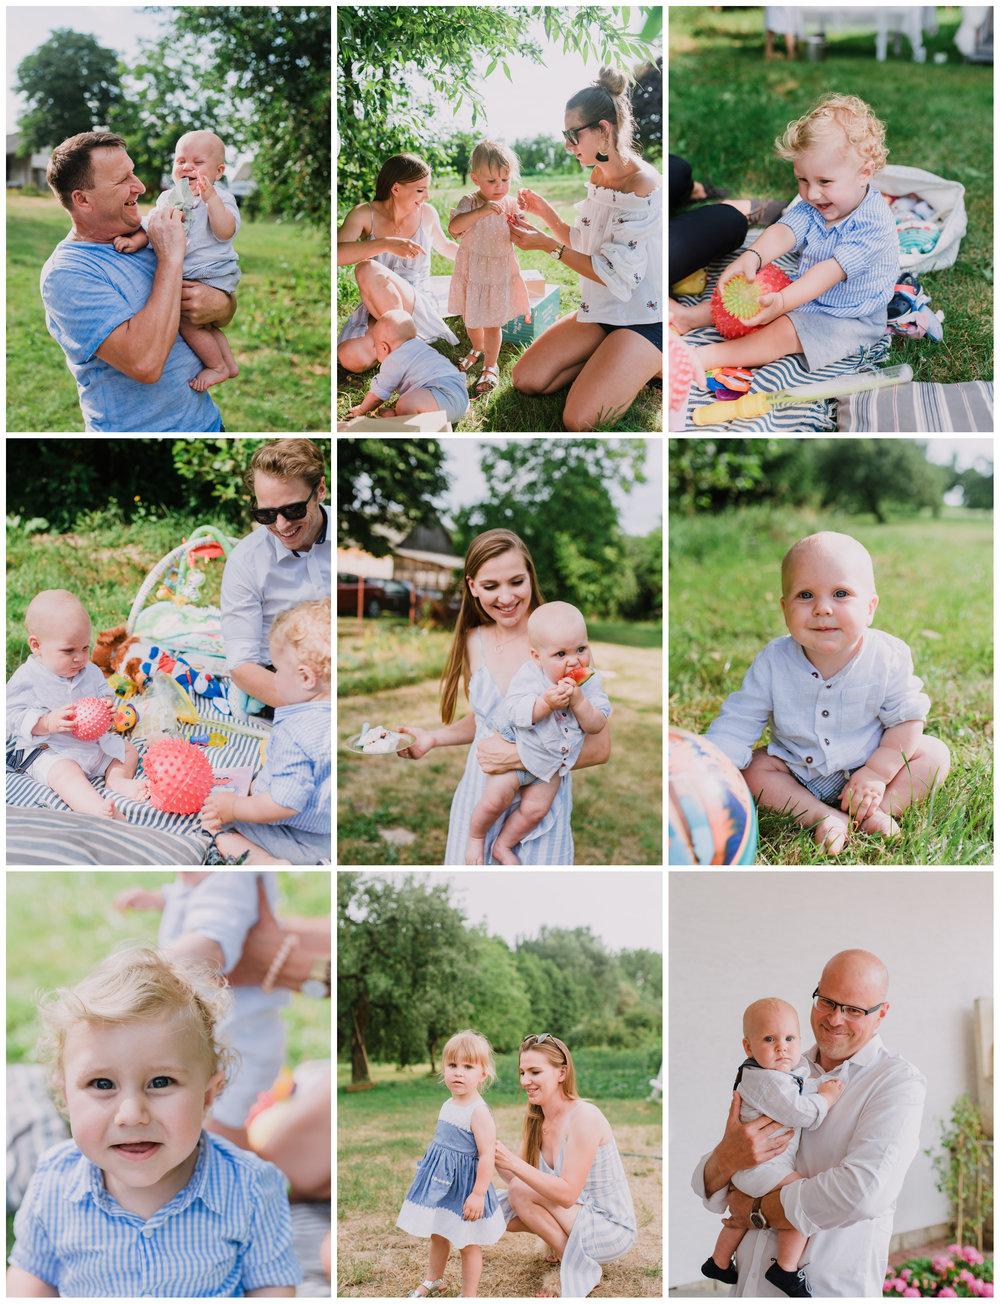 family photographer belfast, northern ireland family photographer, family sessions, family shoot, family photographer, family shoots.jpg